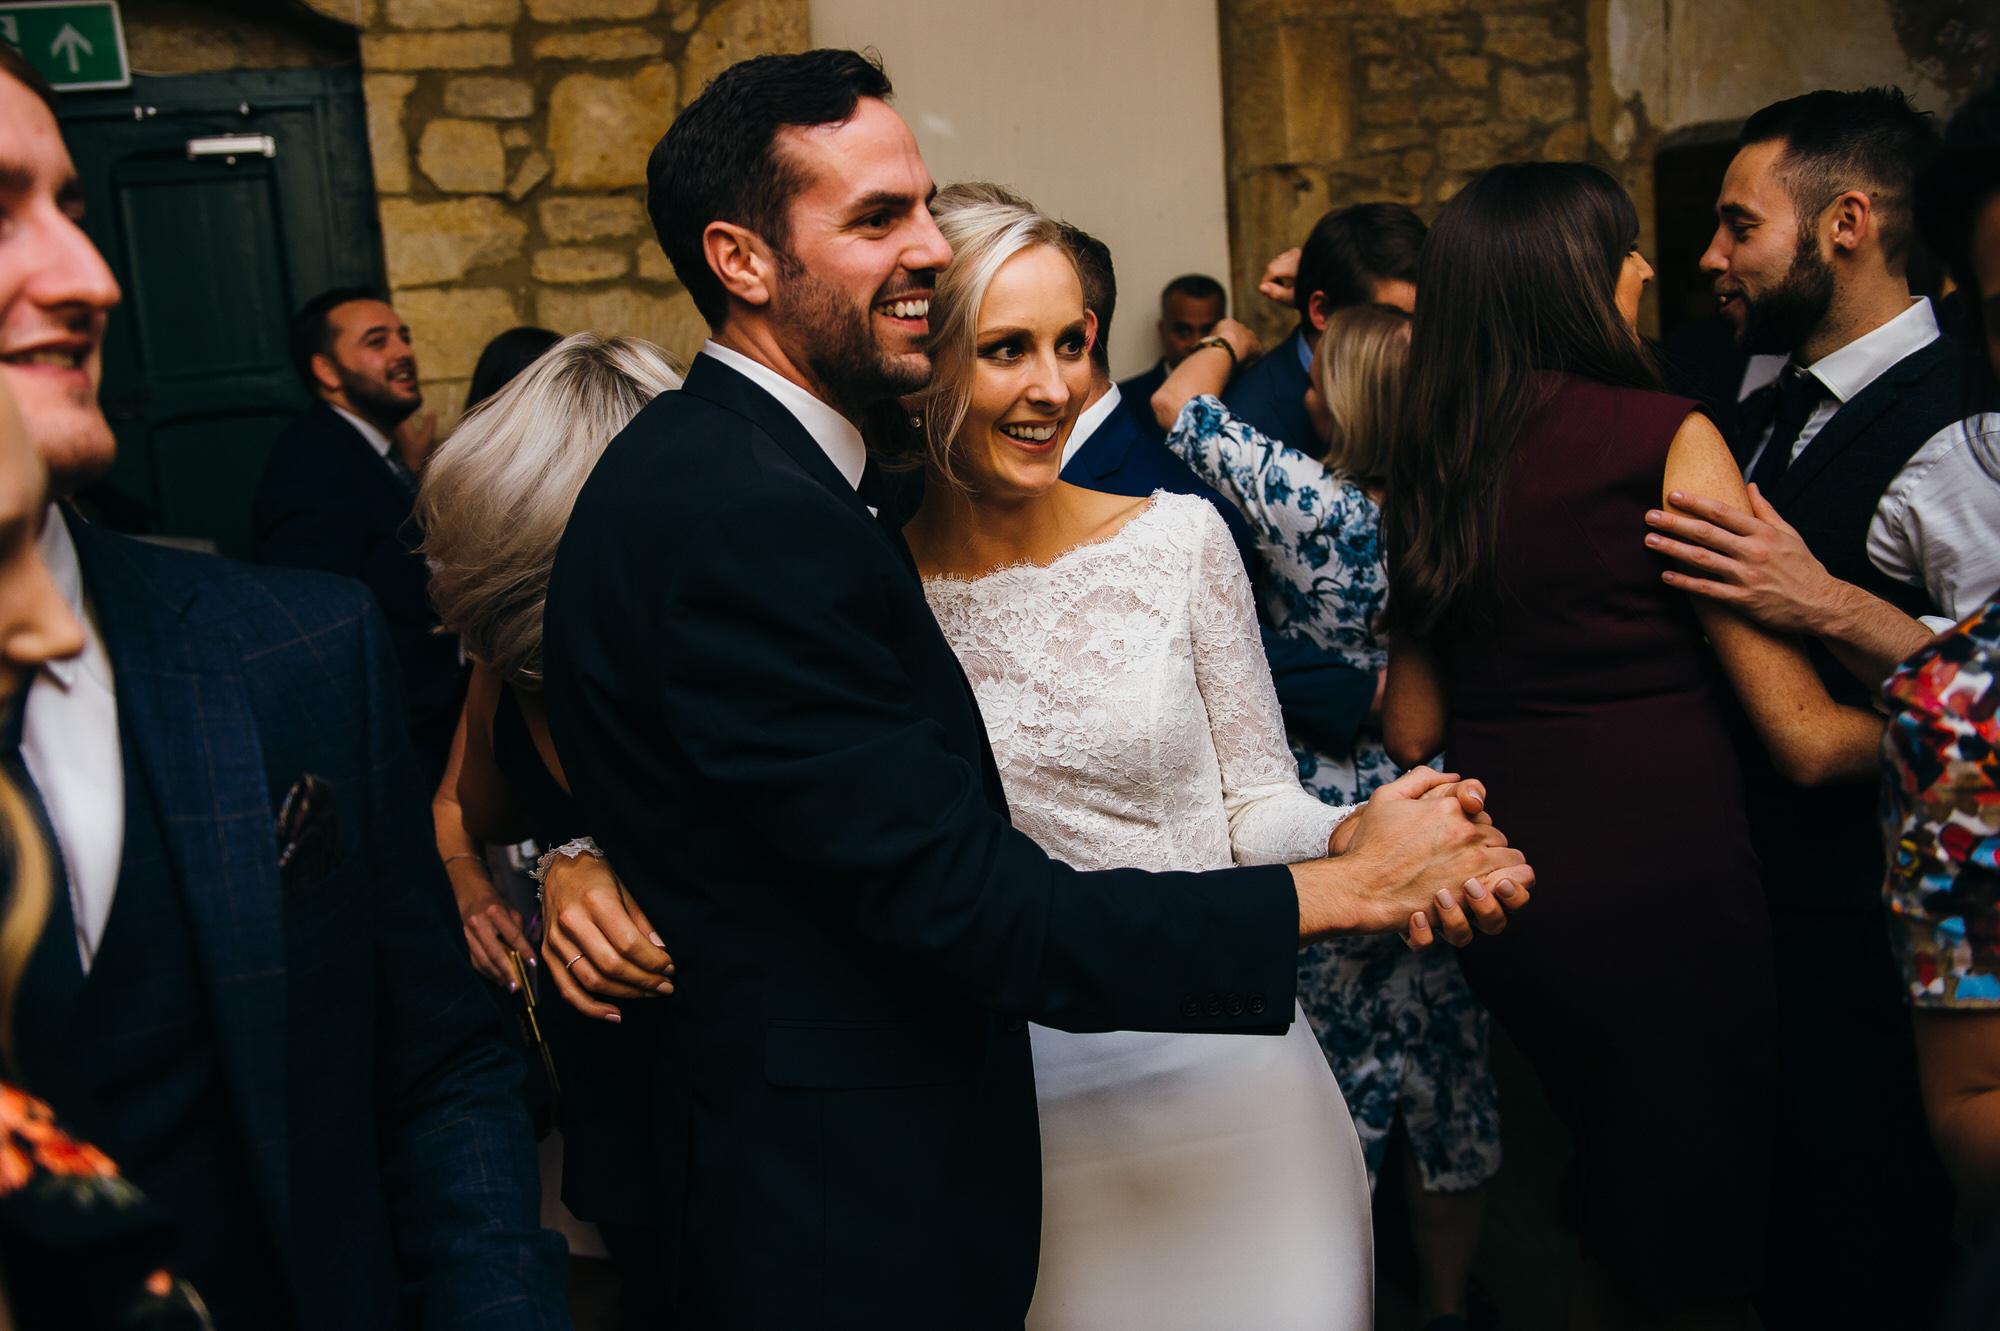 Brympton wedding first dance by simon biffen photography 45